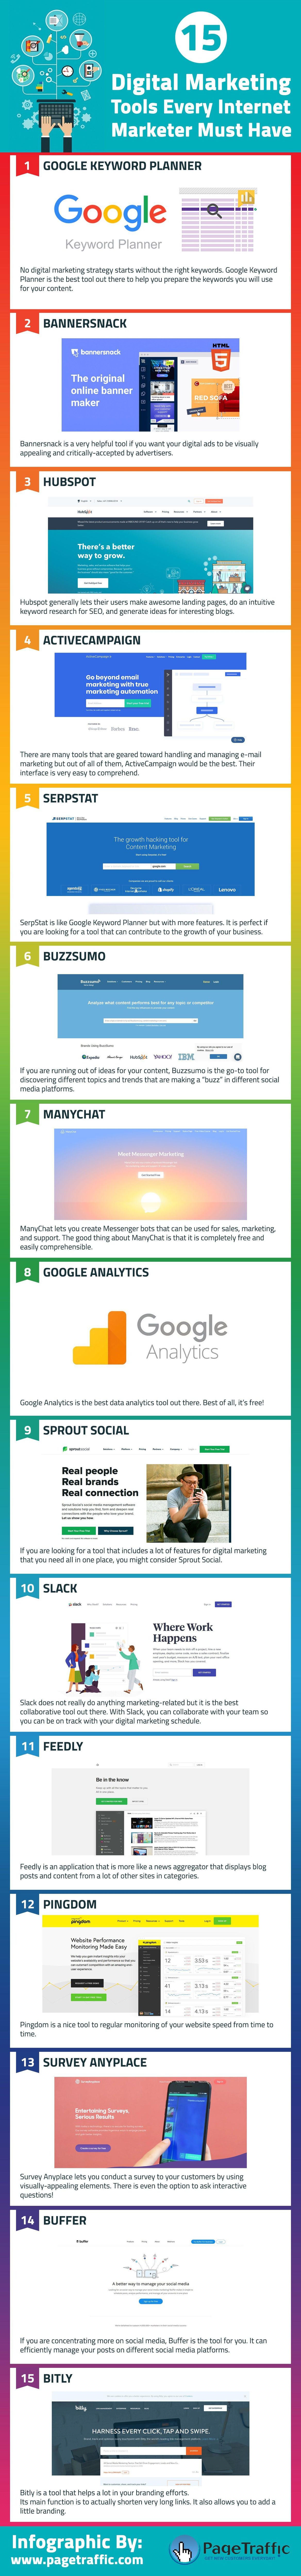 15-Essential-Digital-Marketing-Tools-For-An-Internet-Marketer